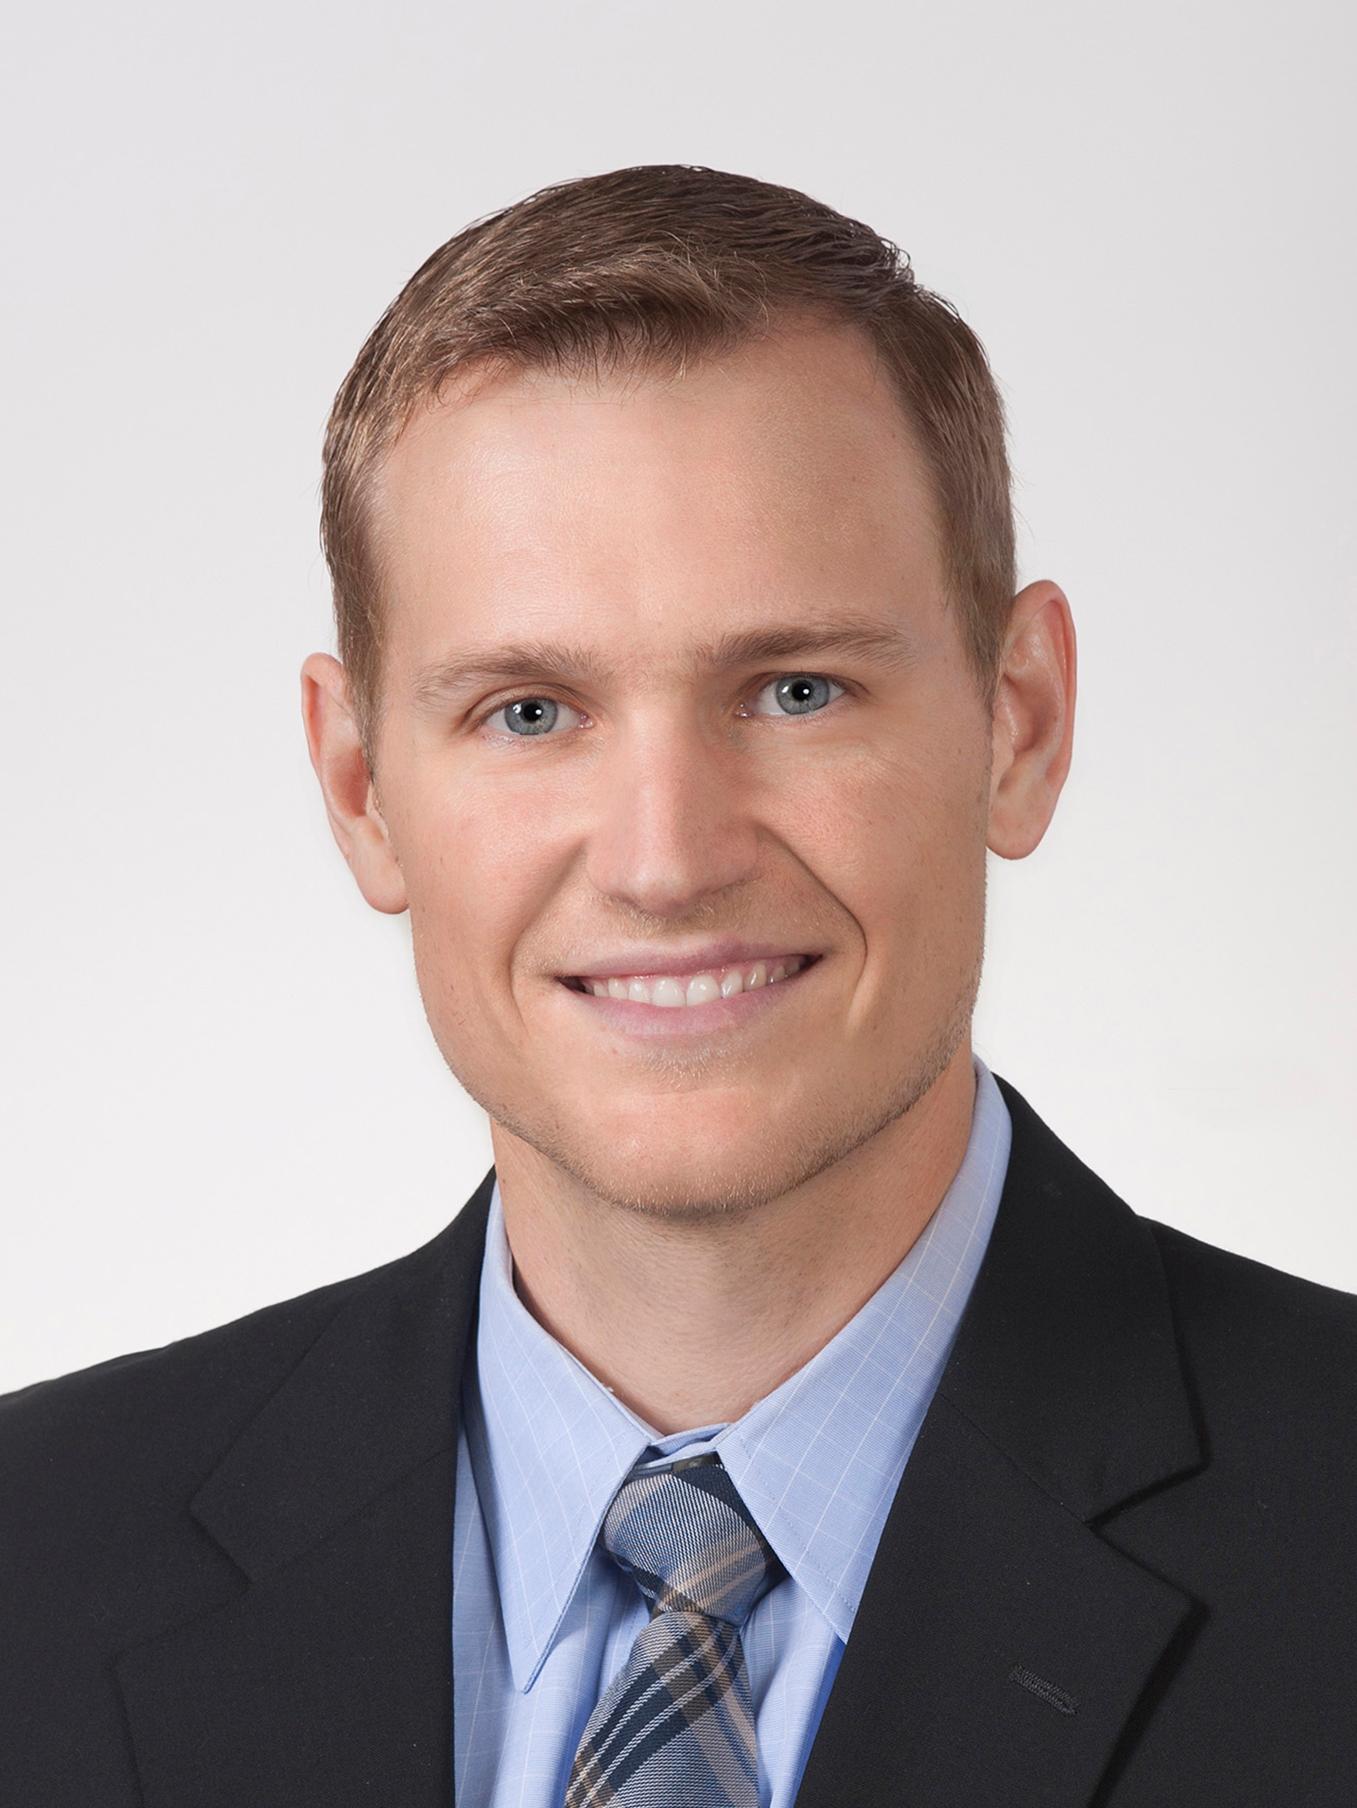 Regan S. Teague, Portfolio Manager and Advisor of Day Hagan Asset Management in Sarasota, FL.